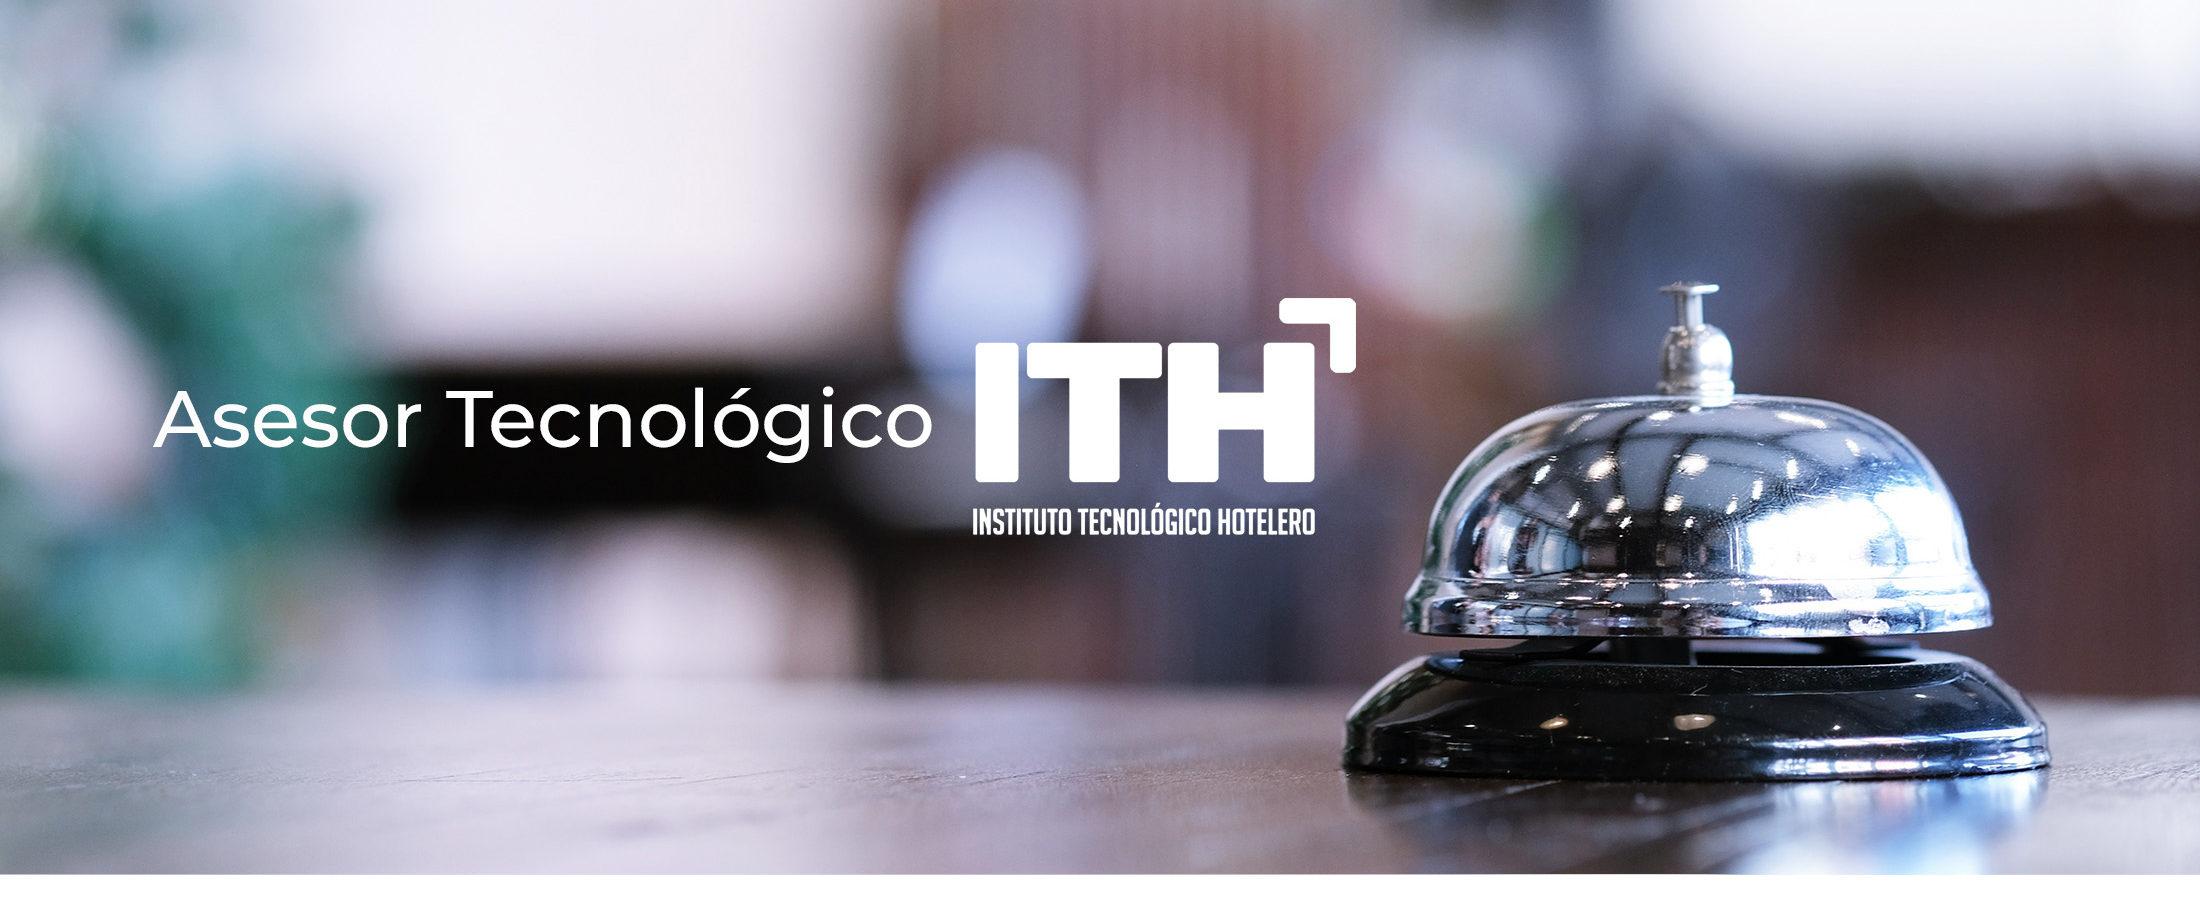 Asesor tecnologico ITH